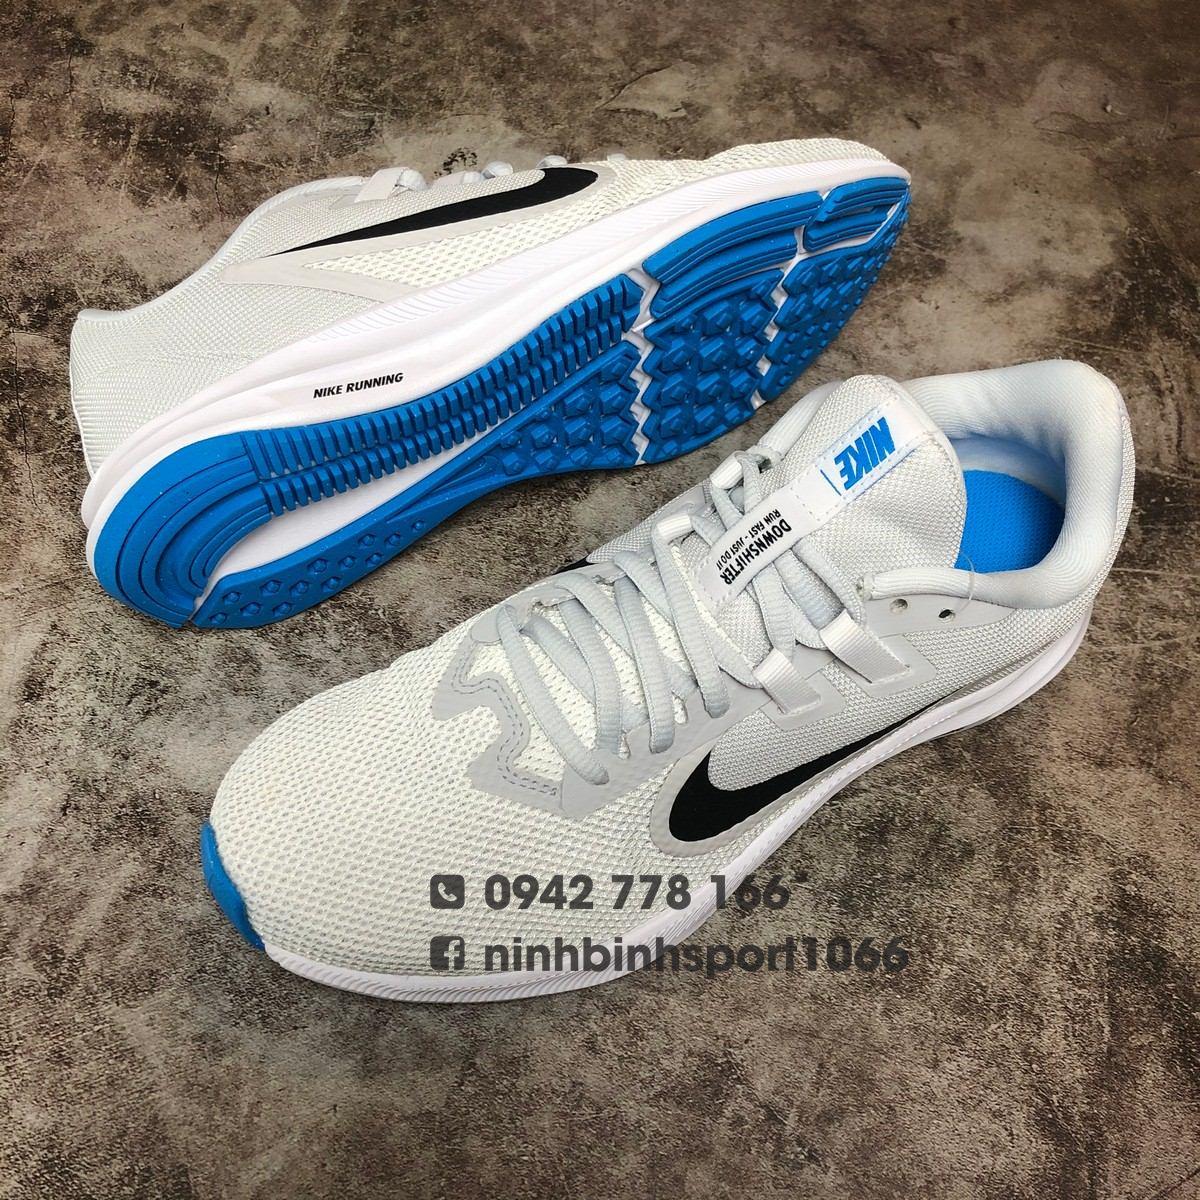 Giầy thể thao nam Nike DownShifter 9 AQ7481-100